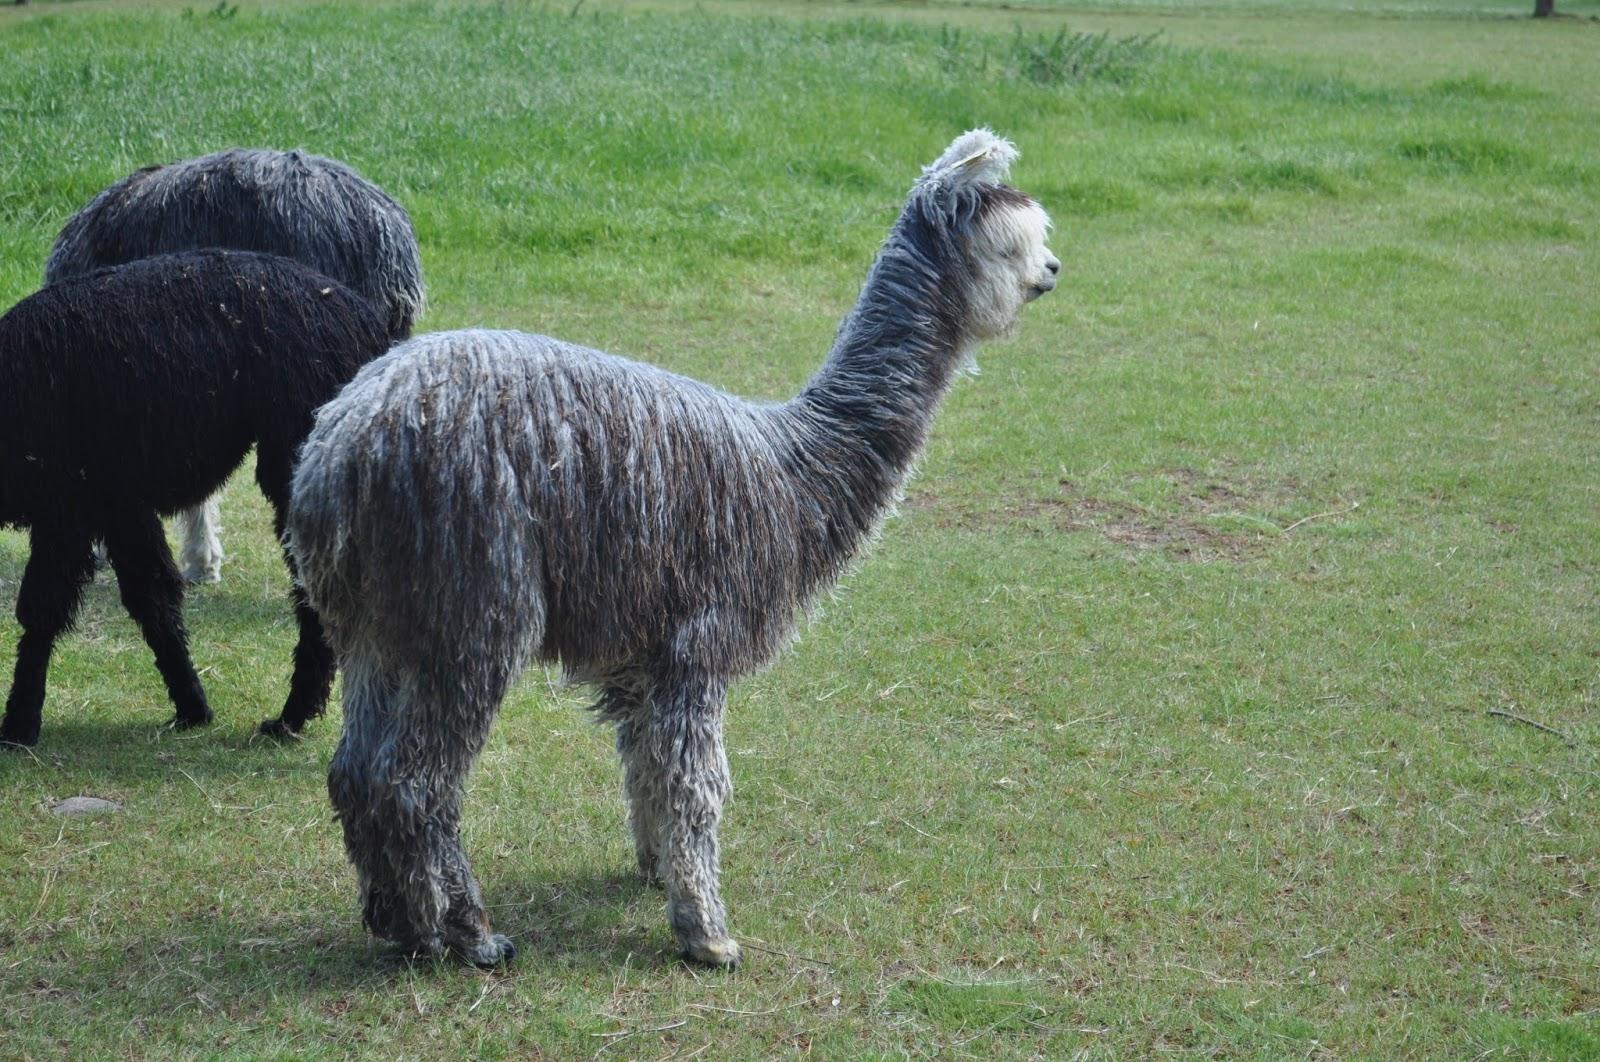 DUTCHCORNER: Visit to an Alpaca farm near Christchurch